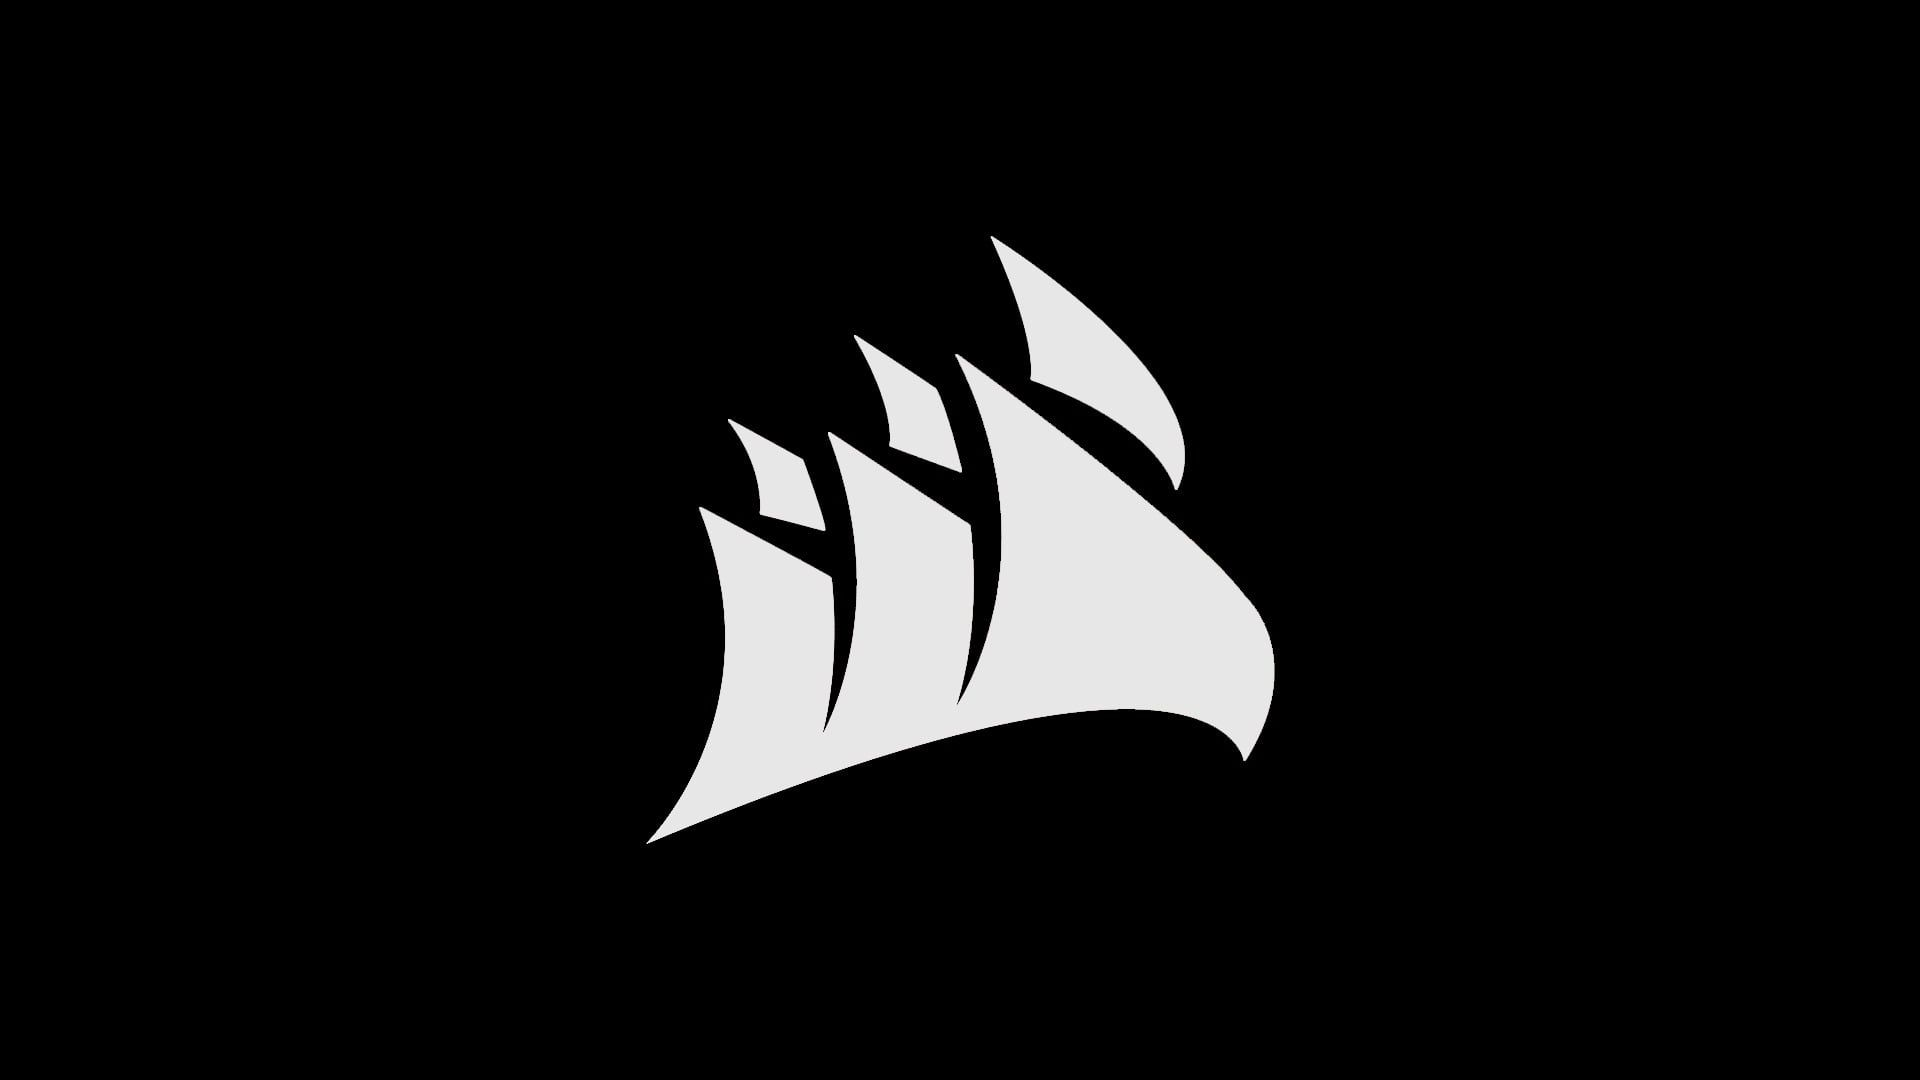 Gray Logo Corsair Pc Gaming Minimalism Monochrome 1080p Wallpaper Hdwallpaper Desktop In 2020 Monochrome Hd Wallpaper Digital Wallpaper